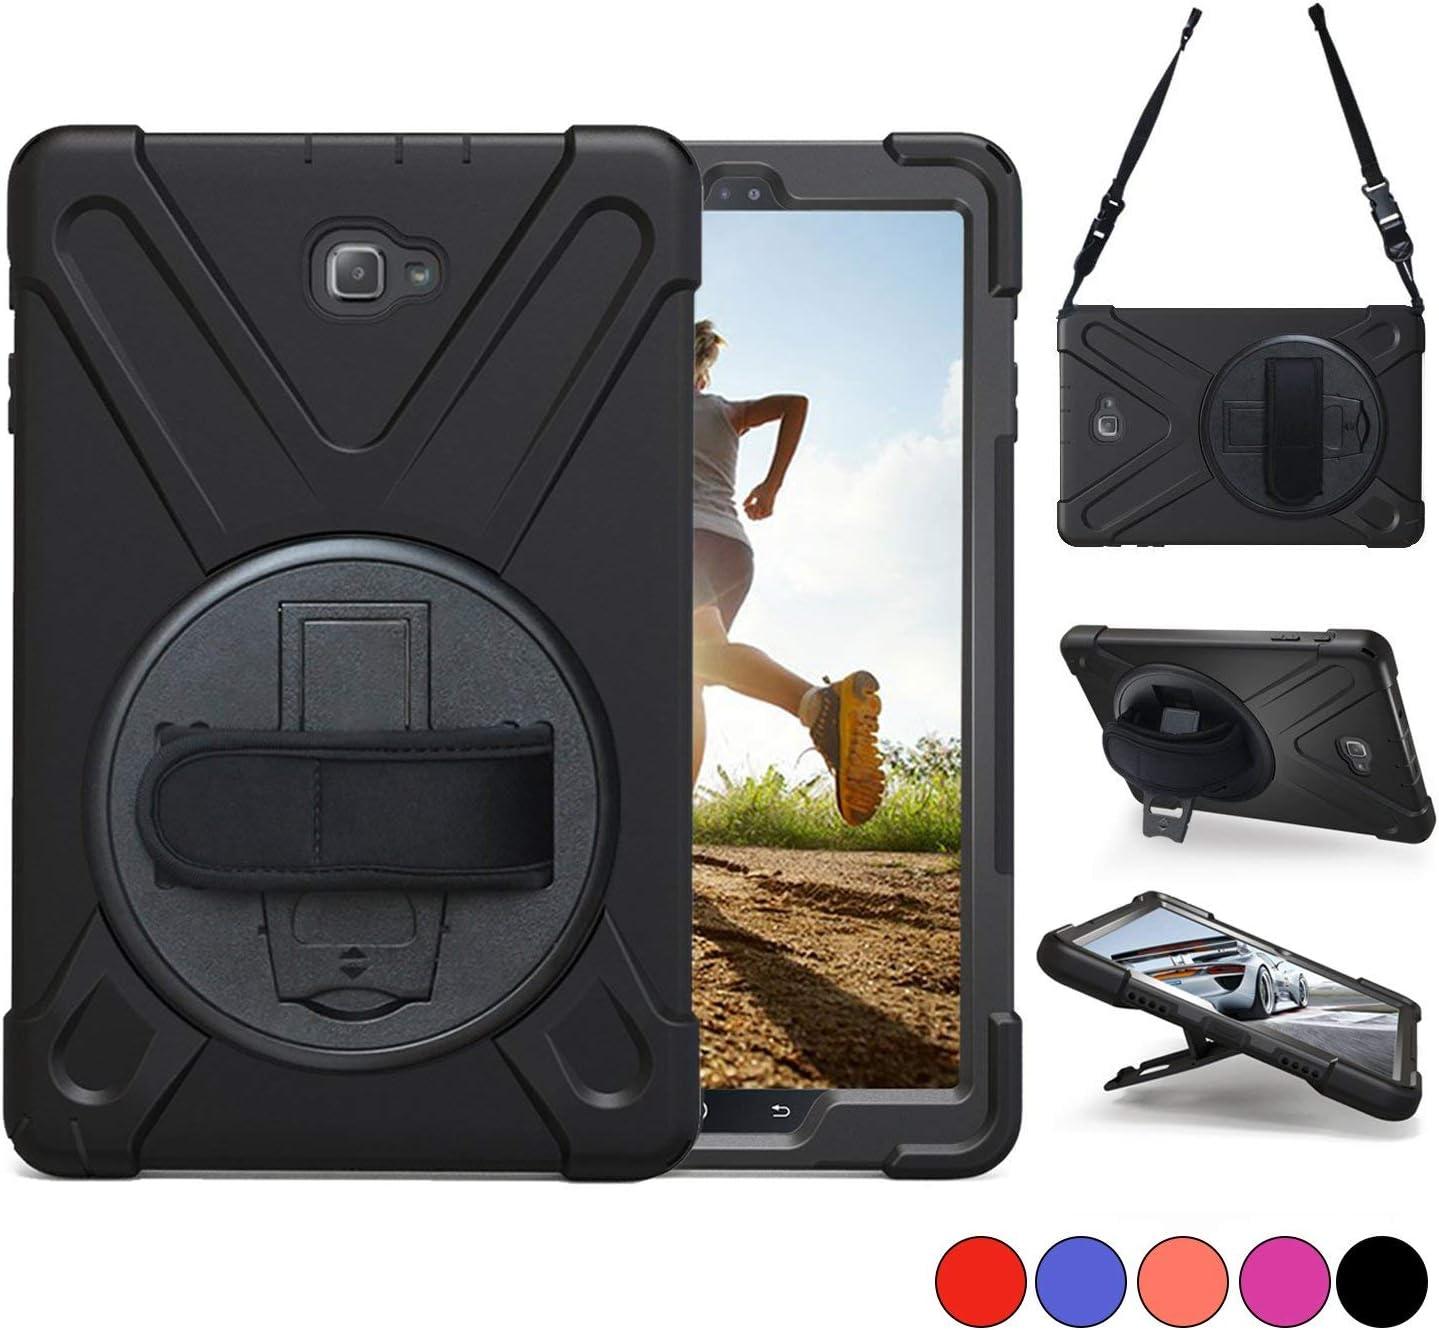 Galaxy Tab A 10.1ケース, TSQ Heavy Duty、頑丈な保護ケースwith Shoulderストラップ/手ストラップ/ 3層回転スタンド、耐衝撃シリコンハードタブレットケースカバーfor Kids Chlidren (ブラック)